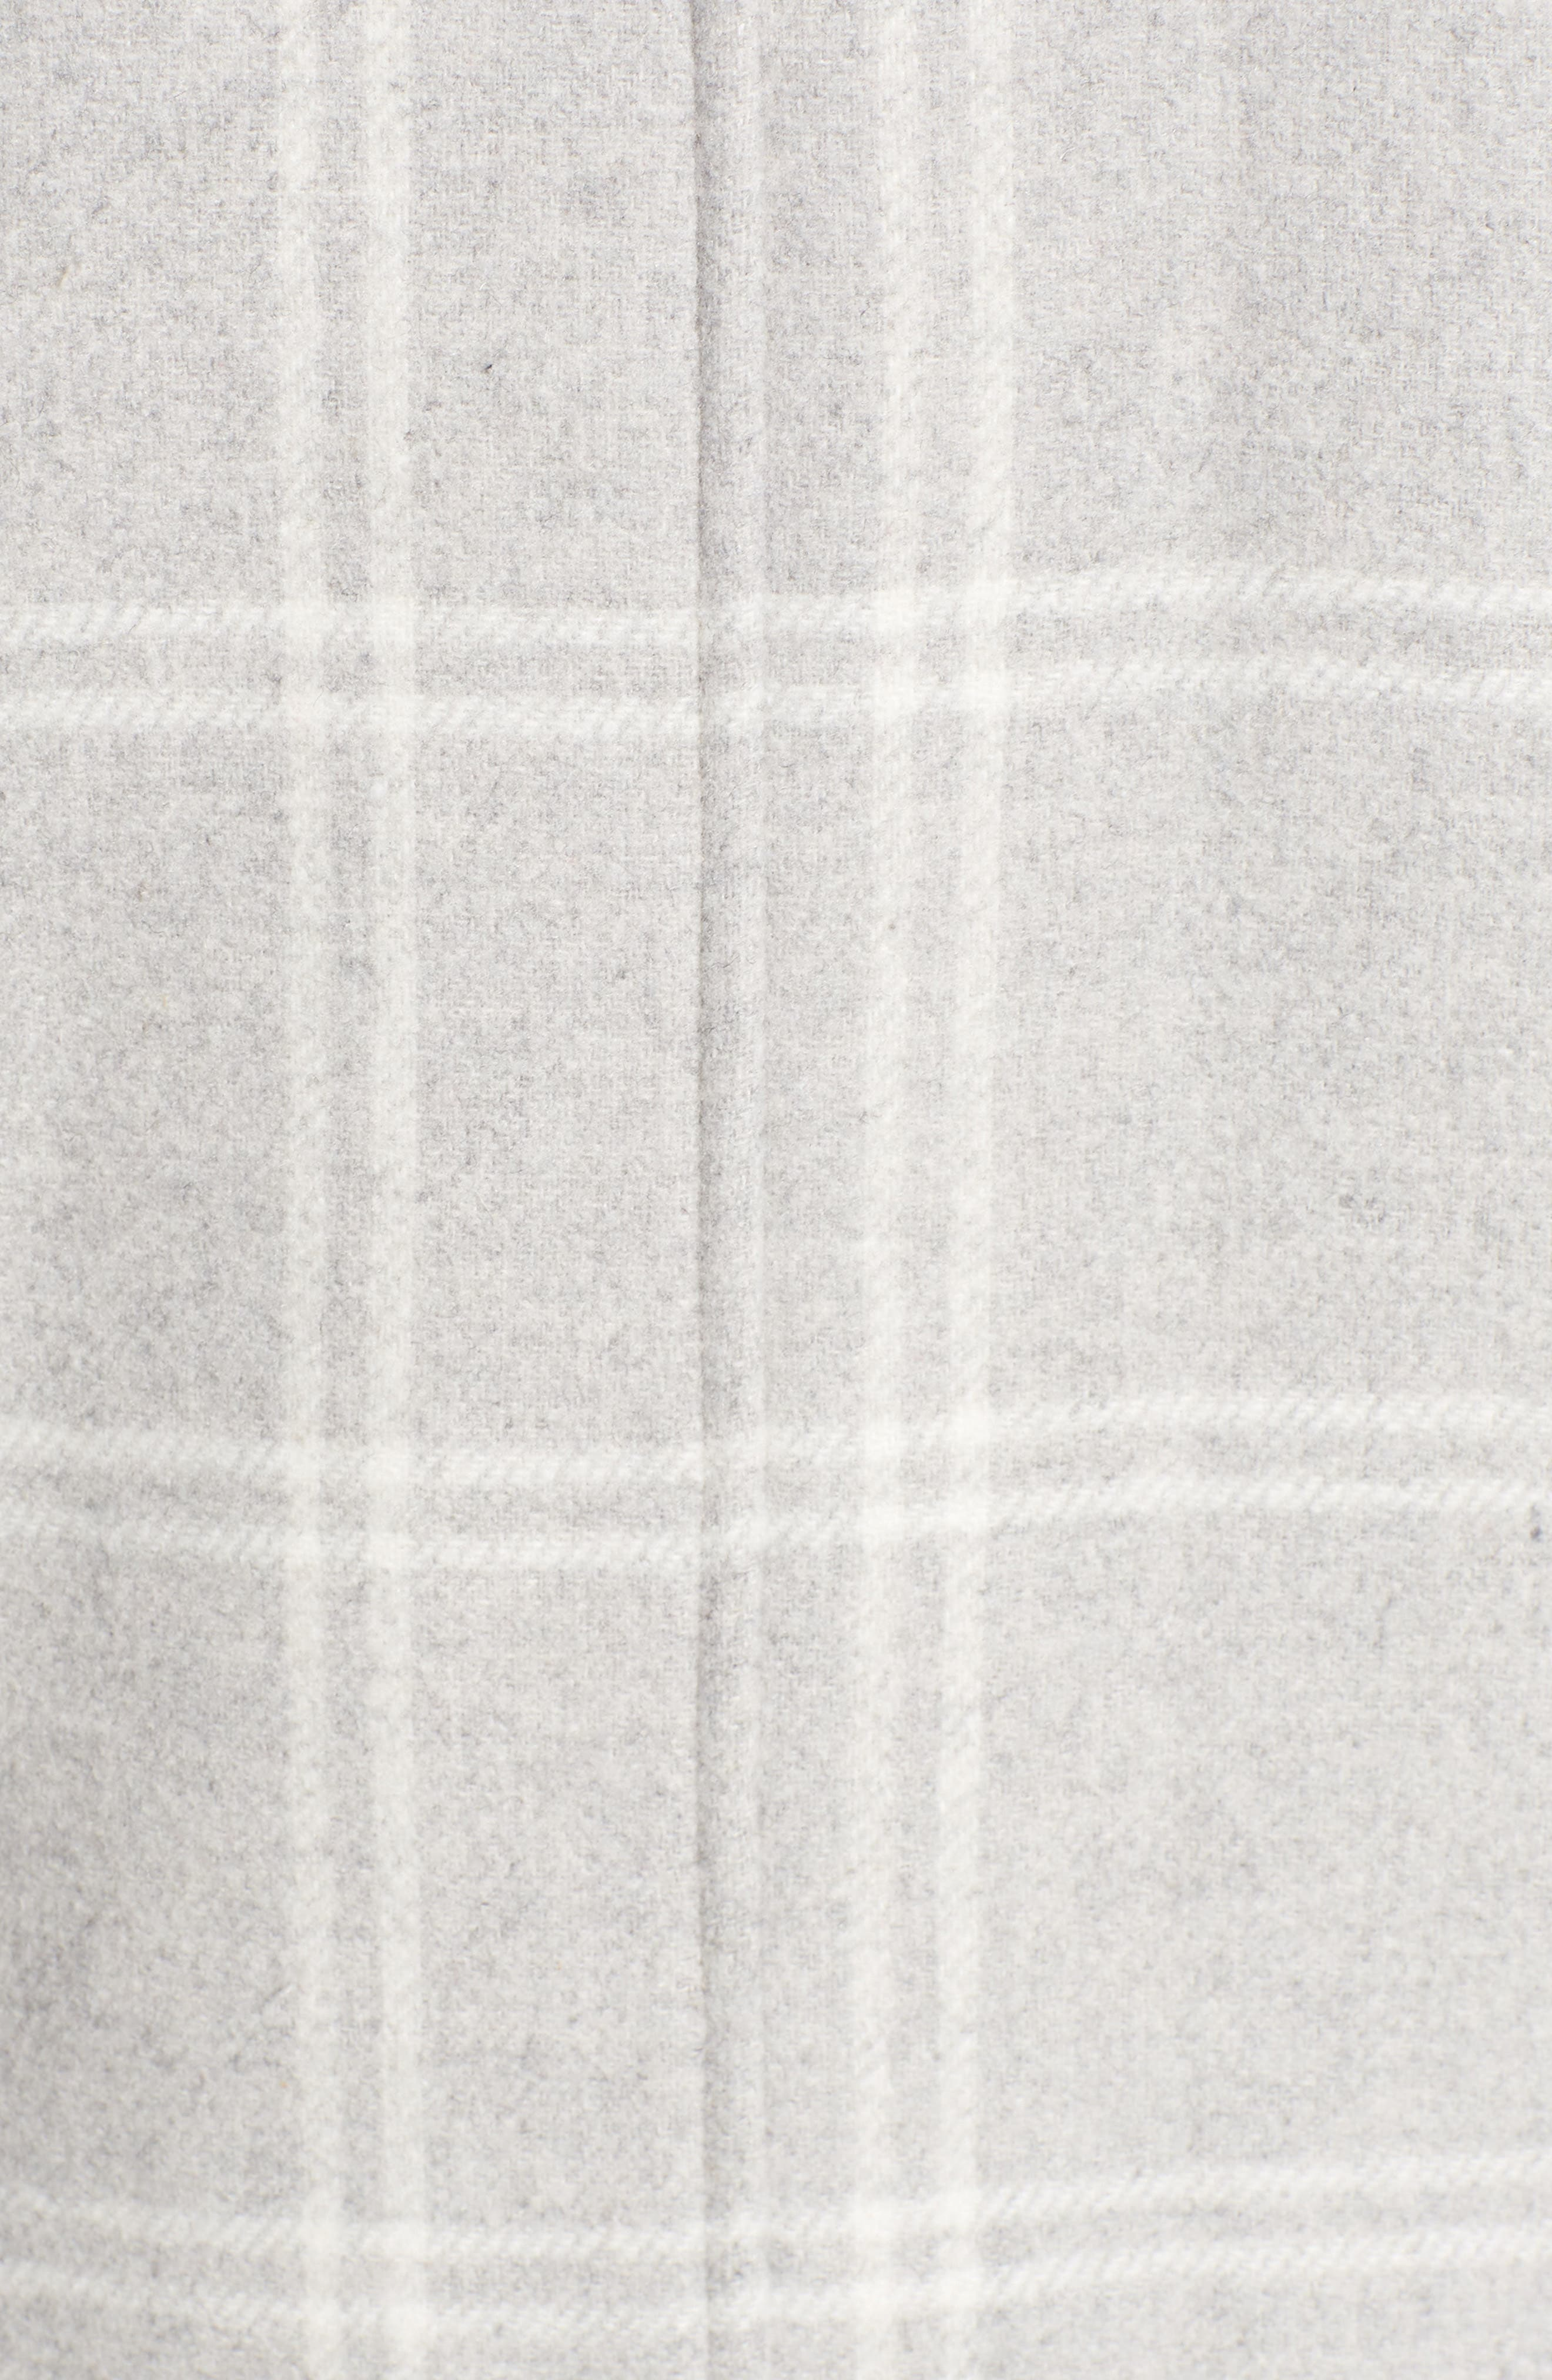 Wool Top Coat,                             Alternate thumbnail 7, color,                             GREY PLAID WOOL